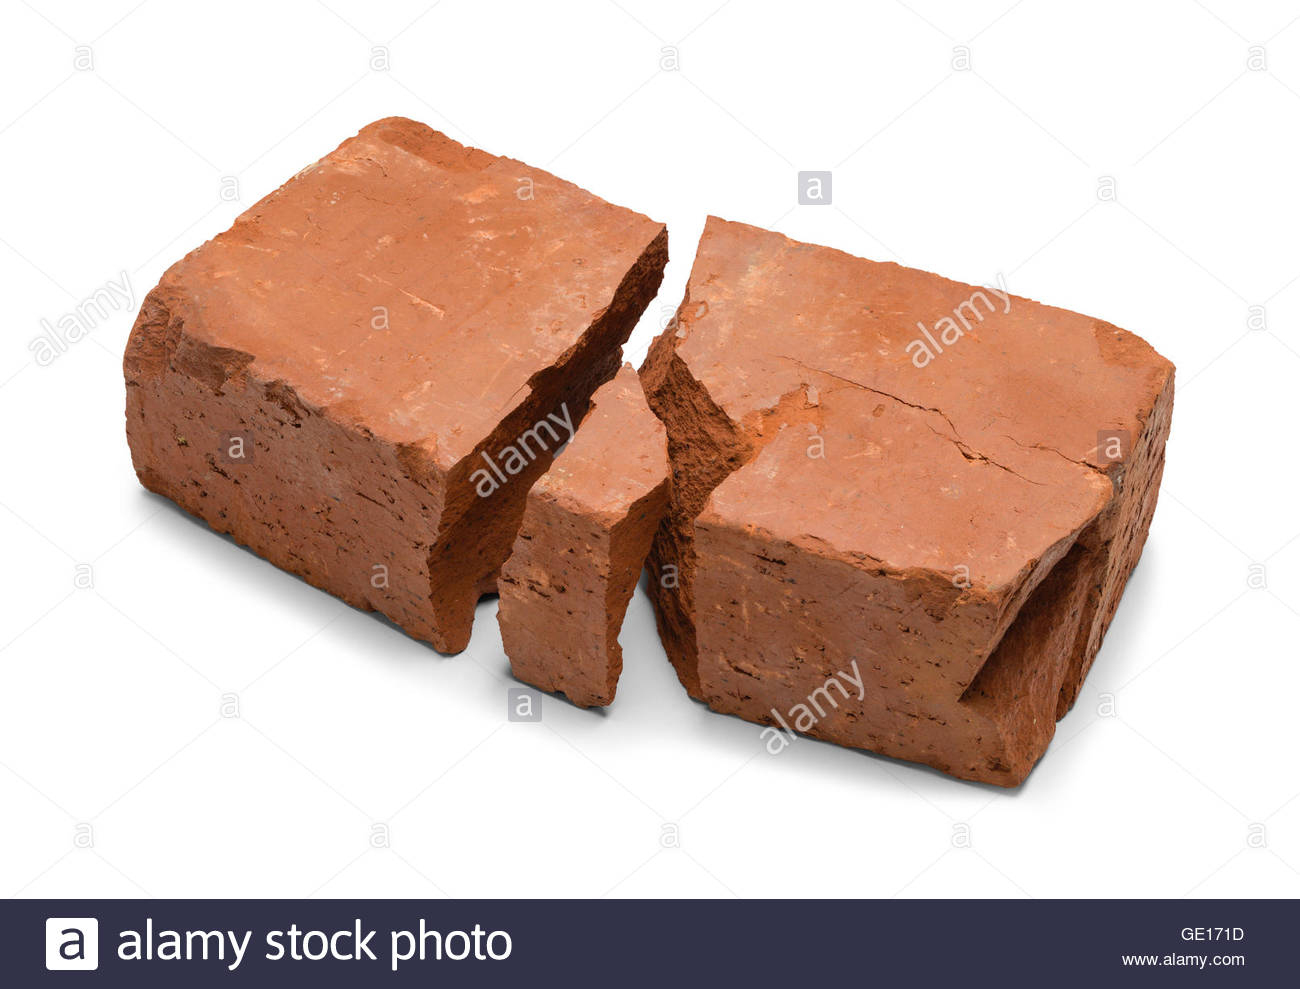 Broken Brick Photos & Broken Brick Images - Alamy encequiconcerne Casse Brick